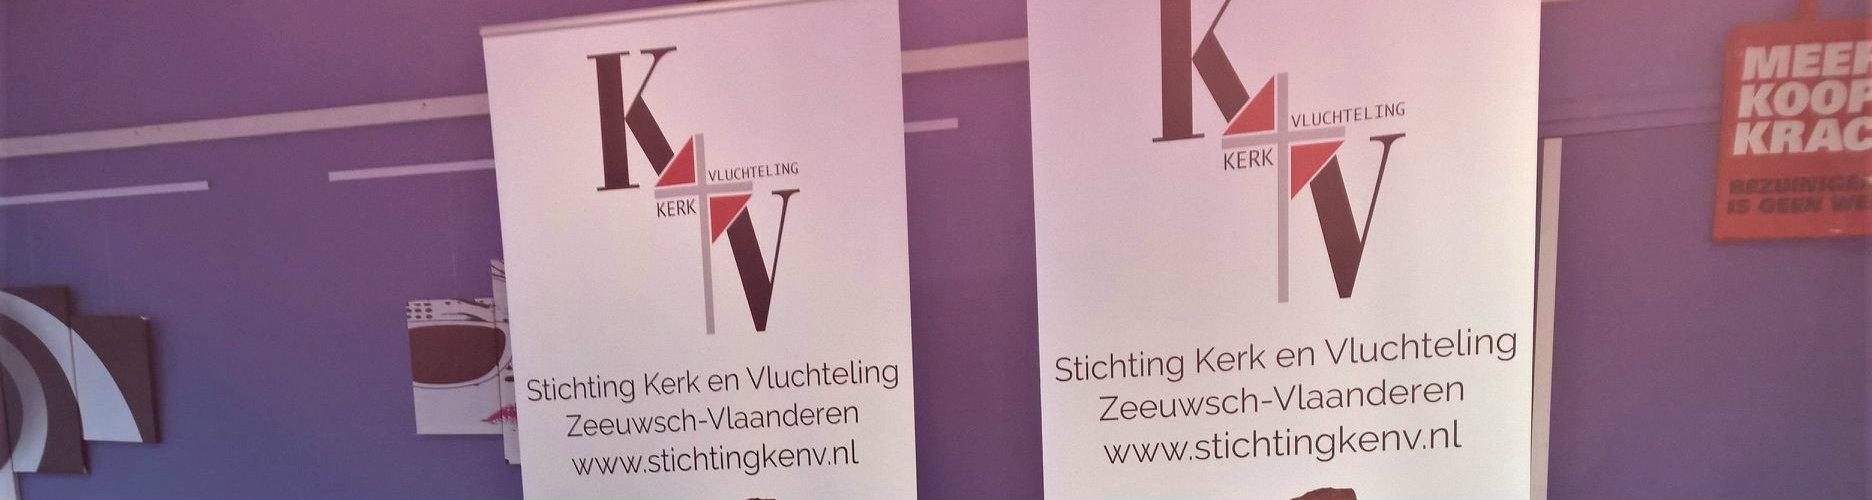 Banners K&V